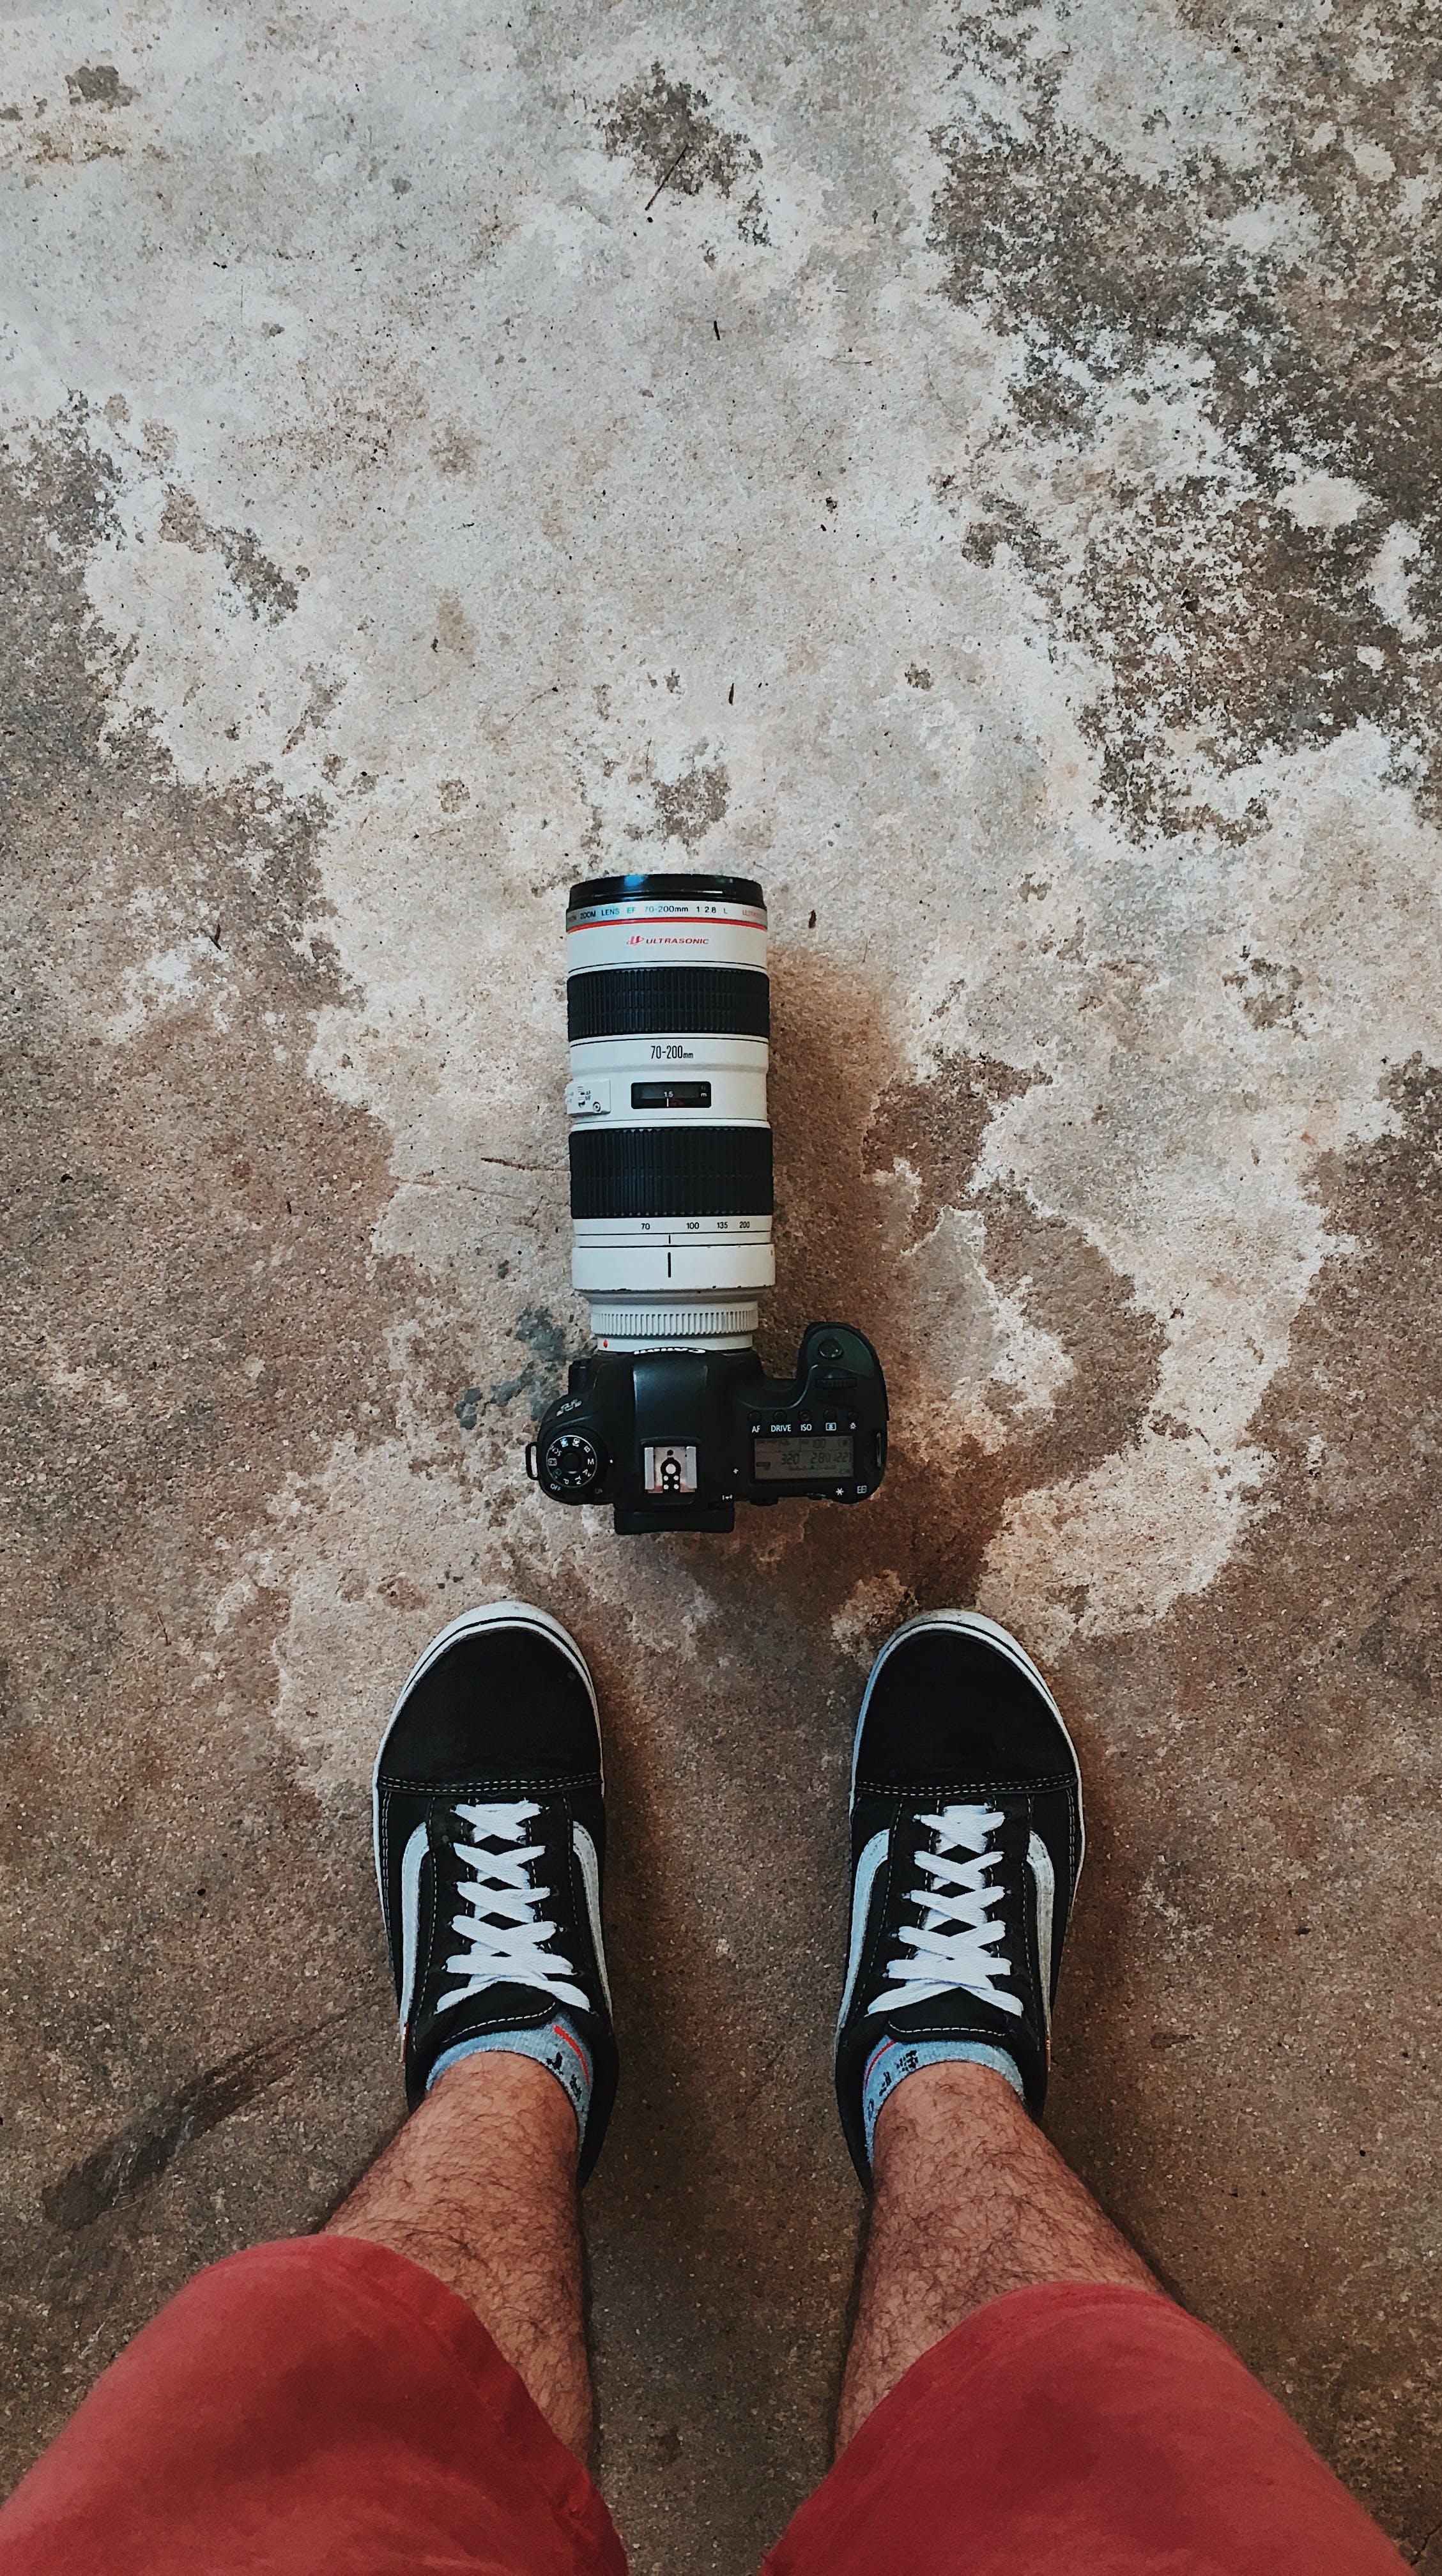 Foto stok gratis canon, juru kamera, kamera, lensa kamera